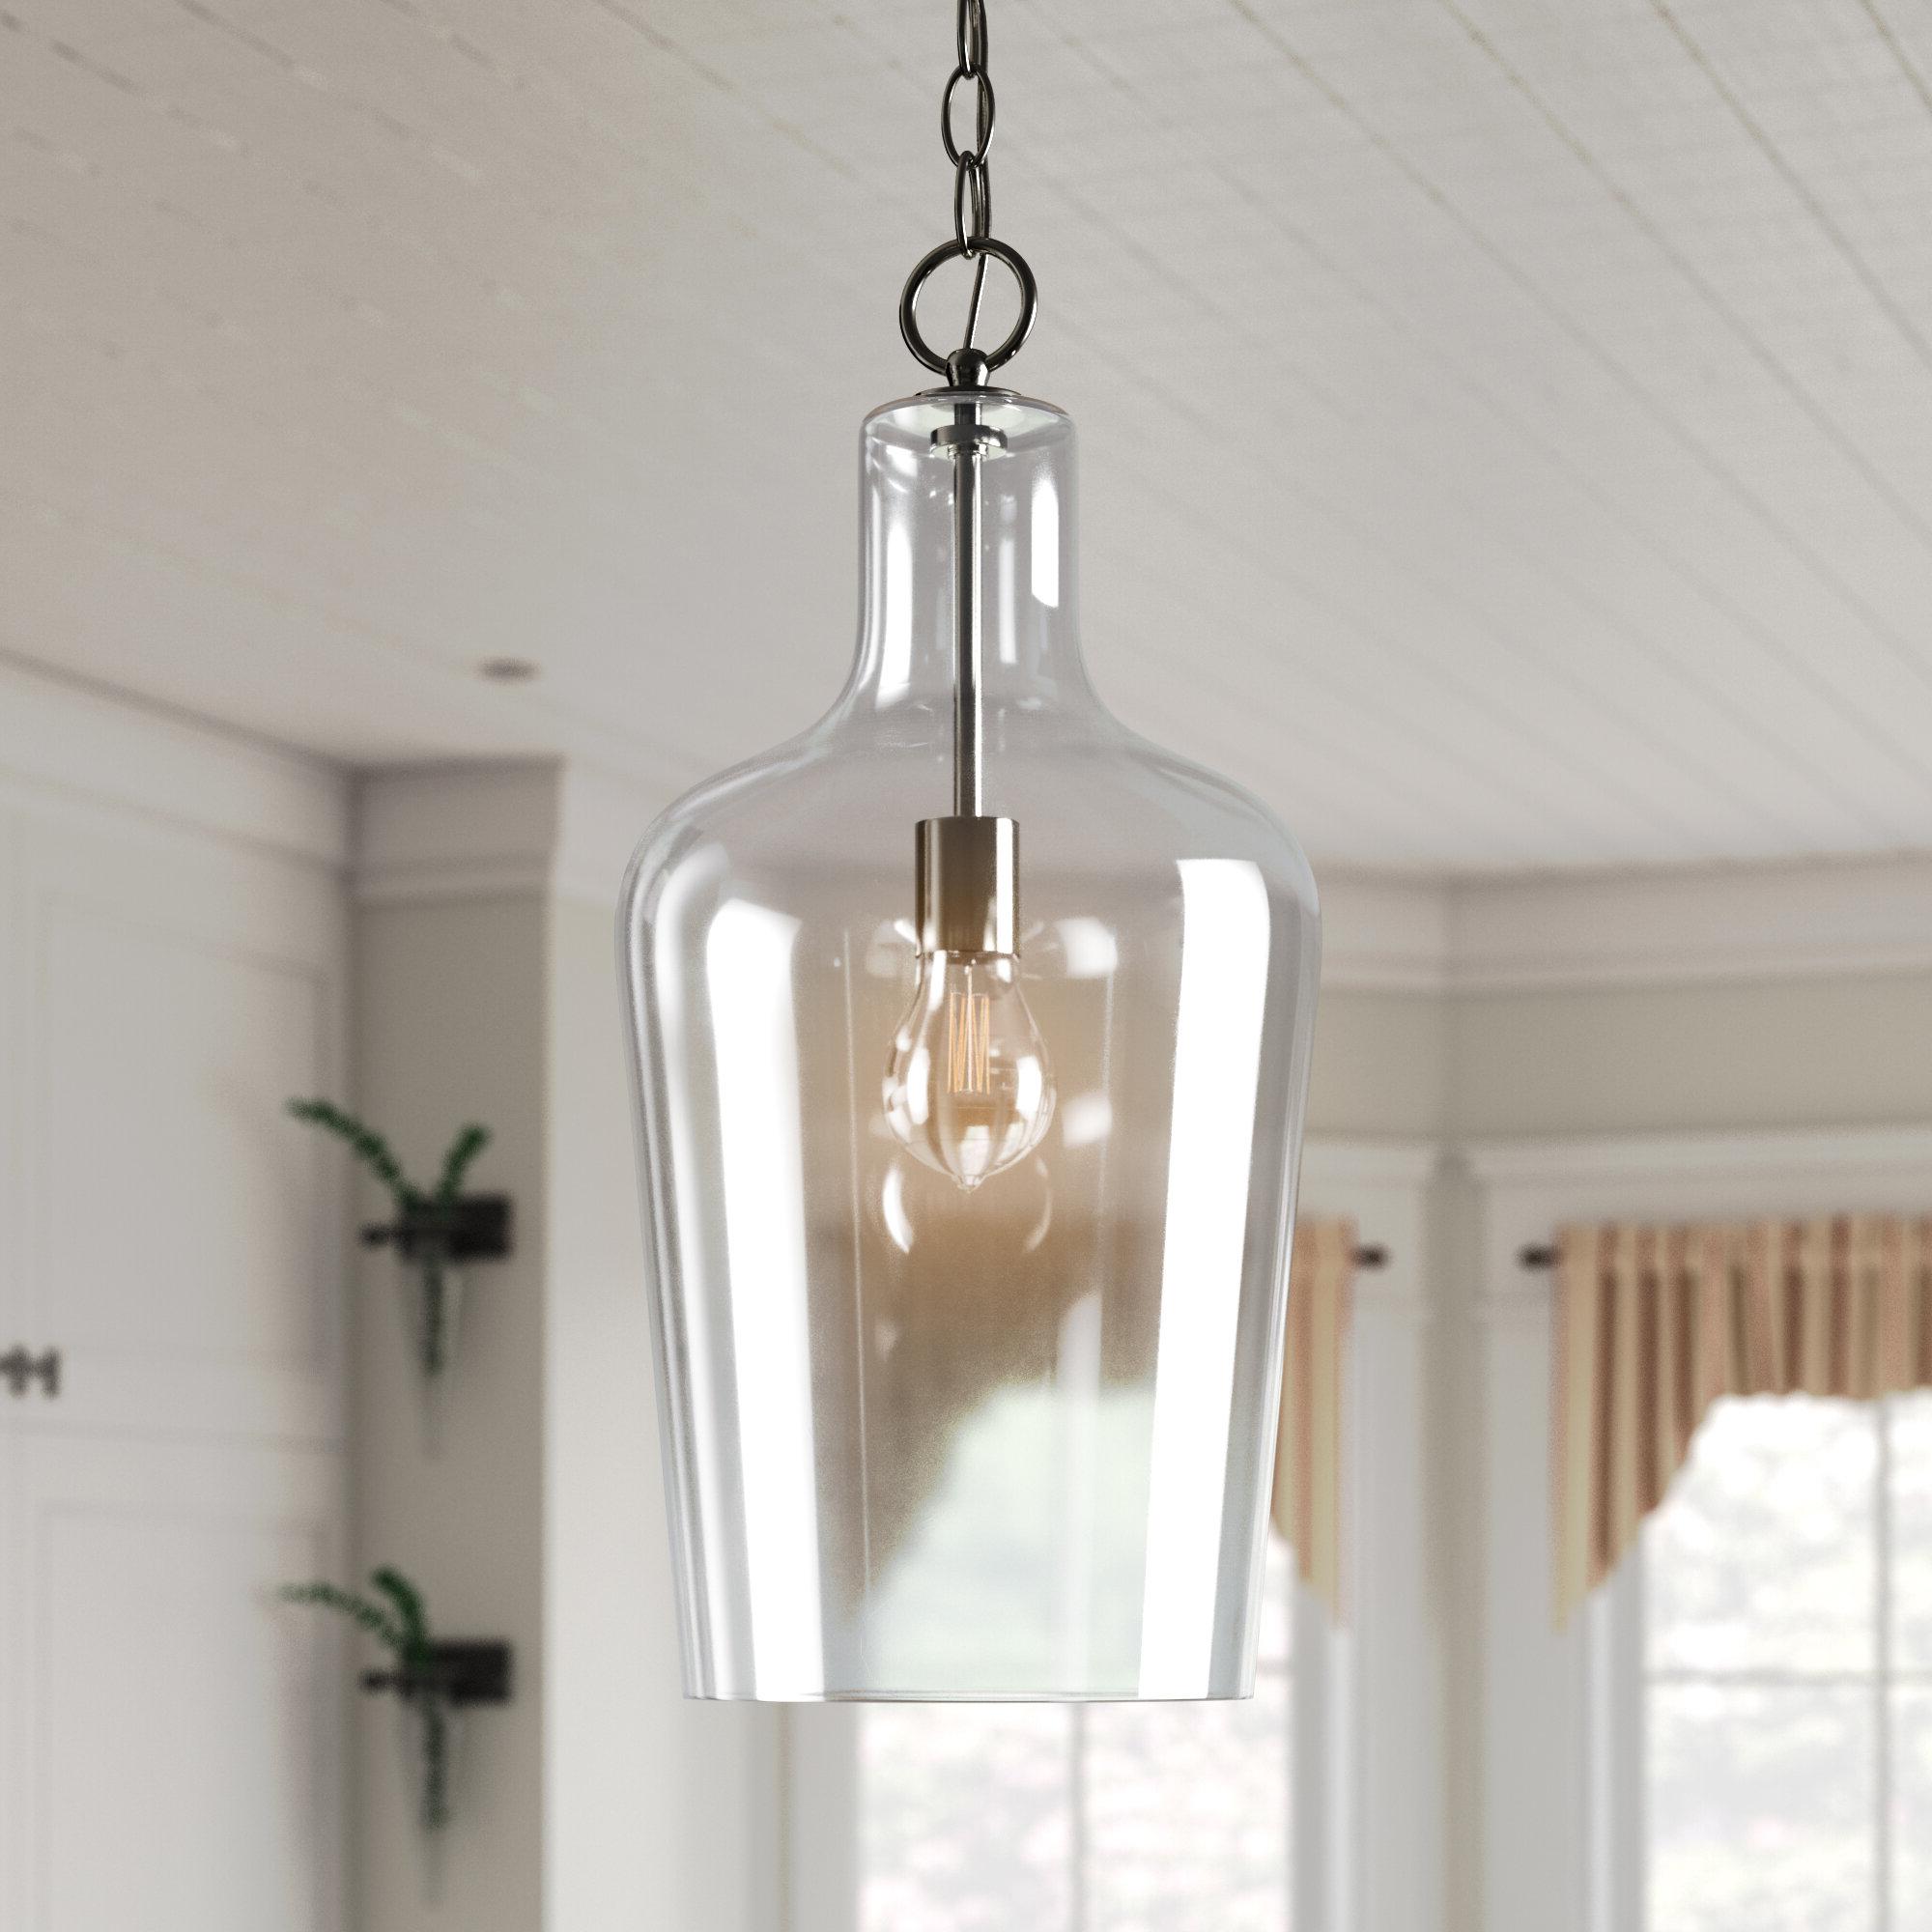 Laurel Foundry Modern Farmhouse Carey 1 Light Single Bell Pendant Regarding Most Current Carey 1 Light Single Bell Pendants (View 11 of 25)